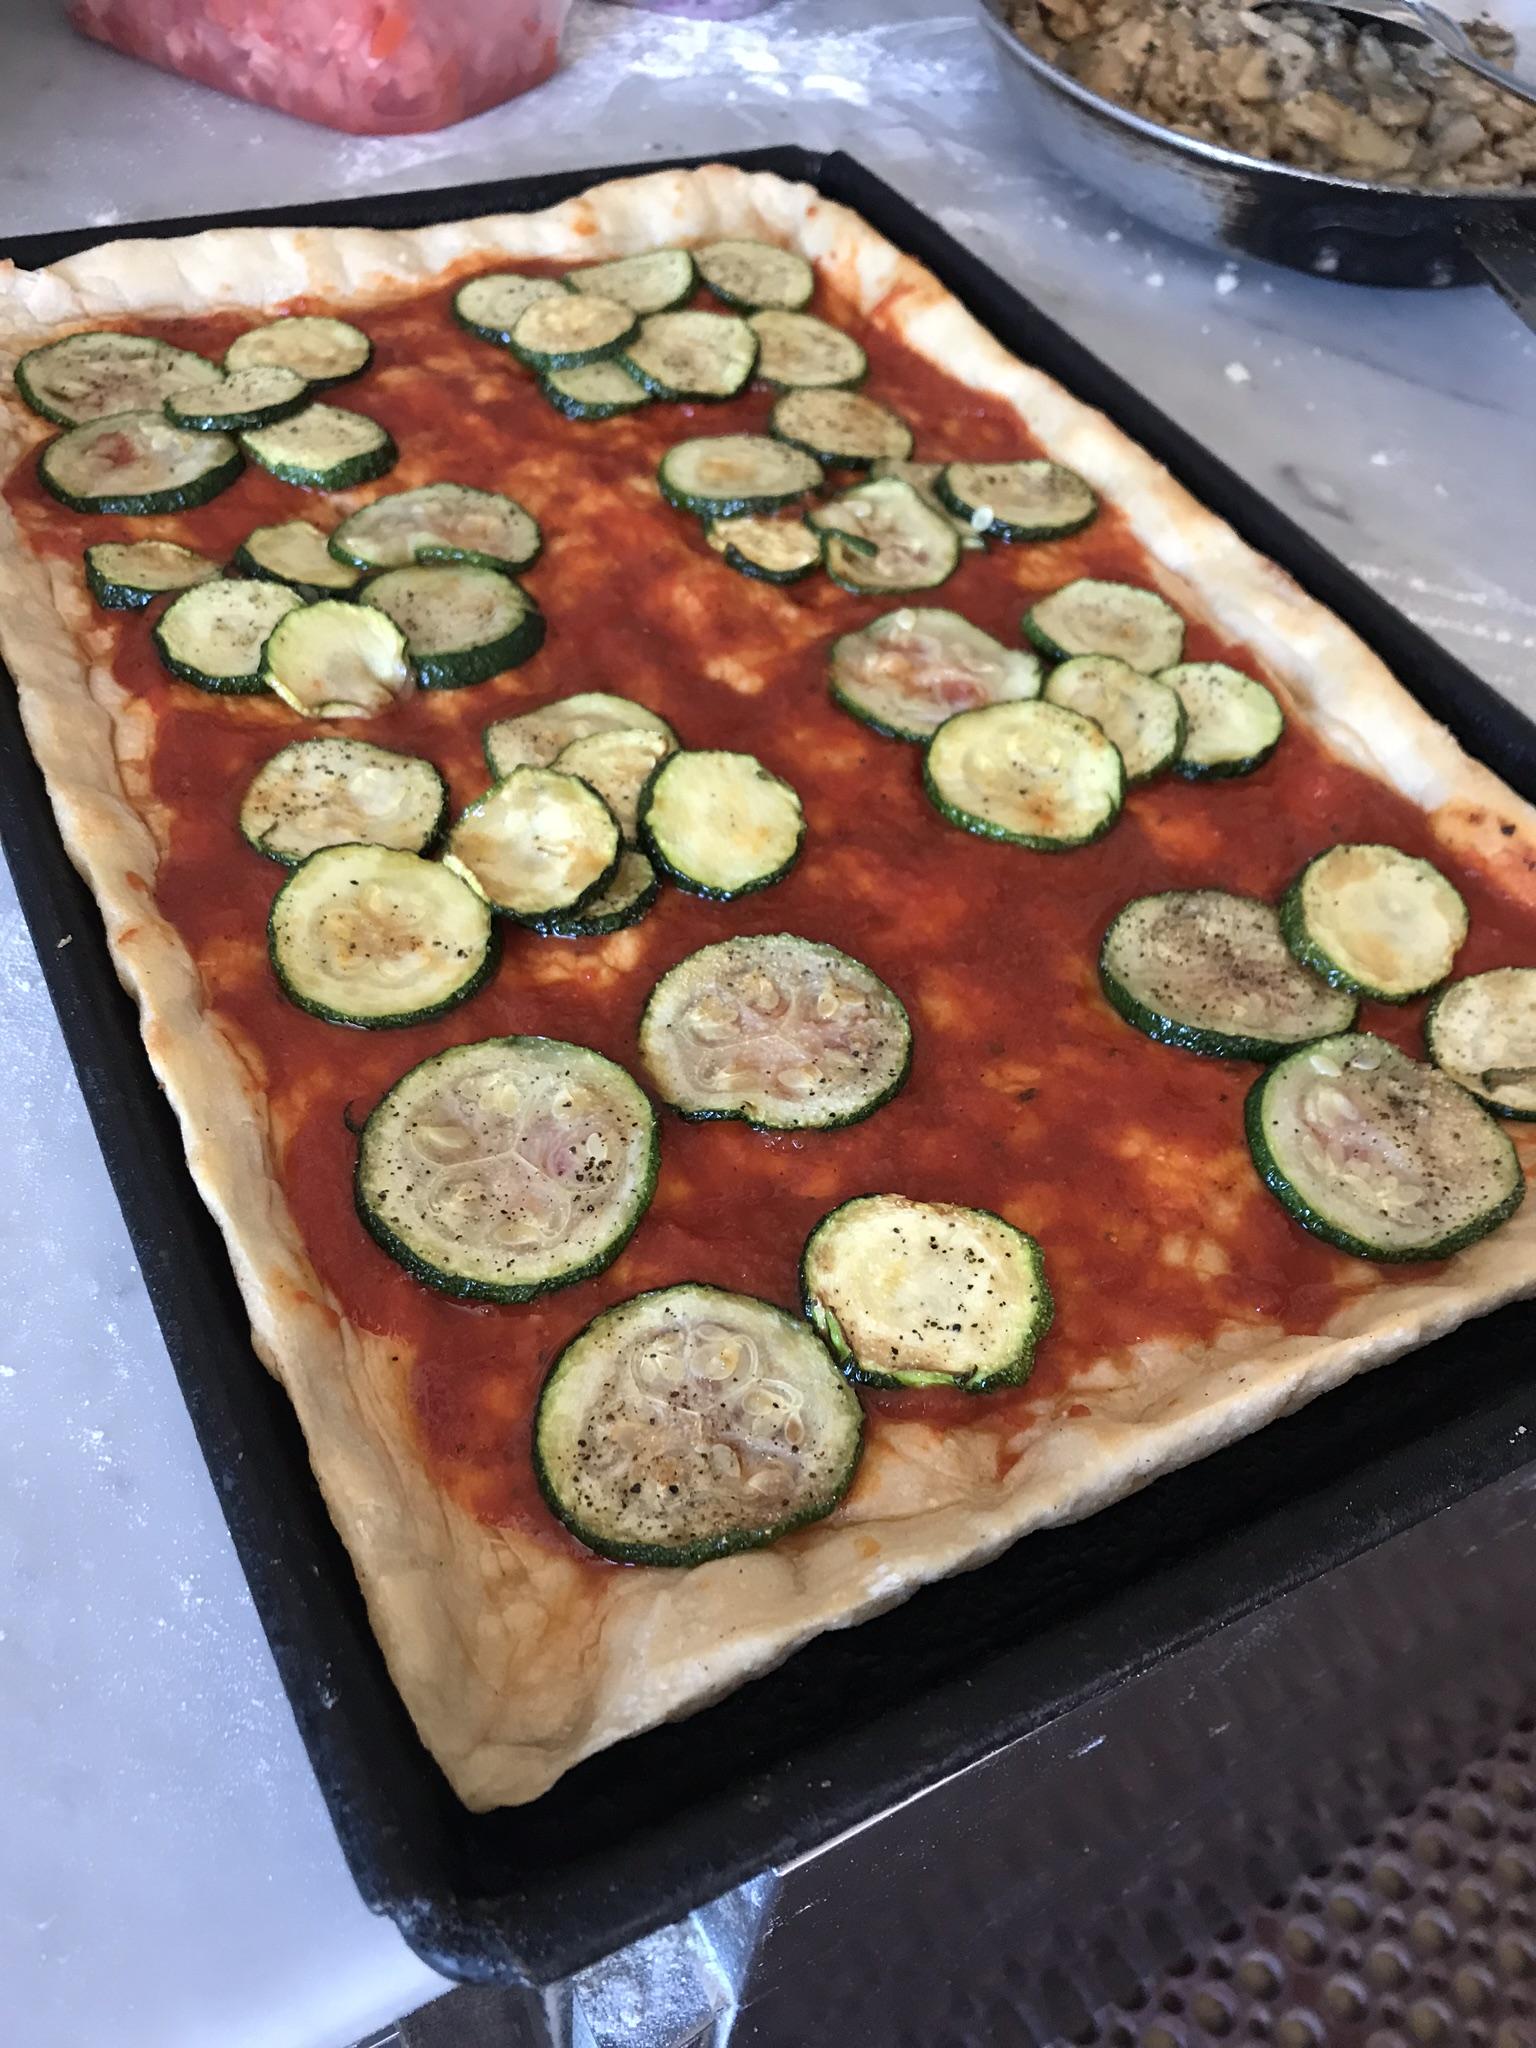 Fresca Pizza step by step adding Zucchini